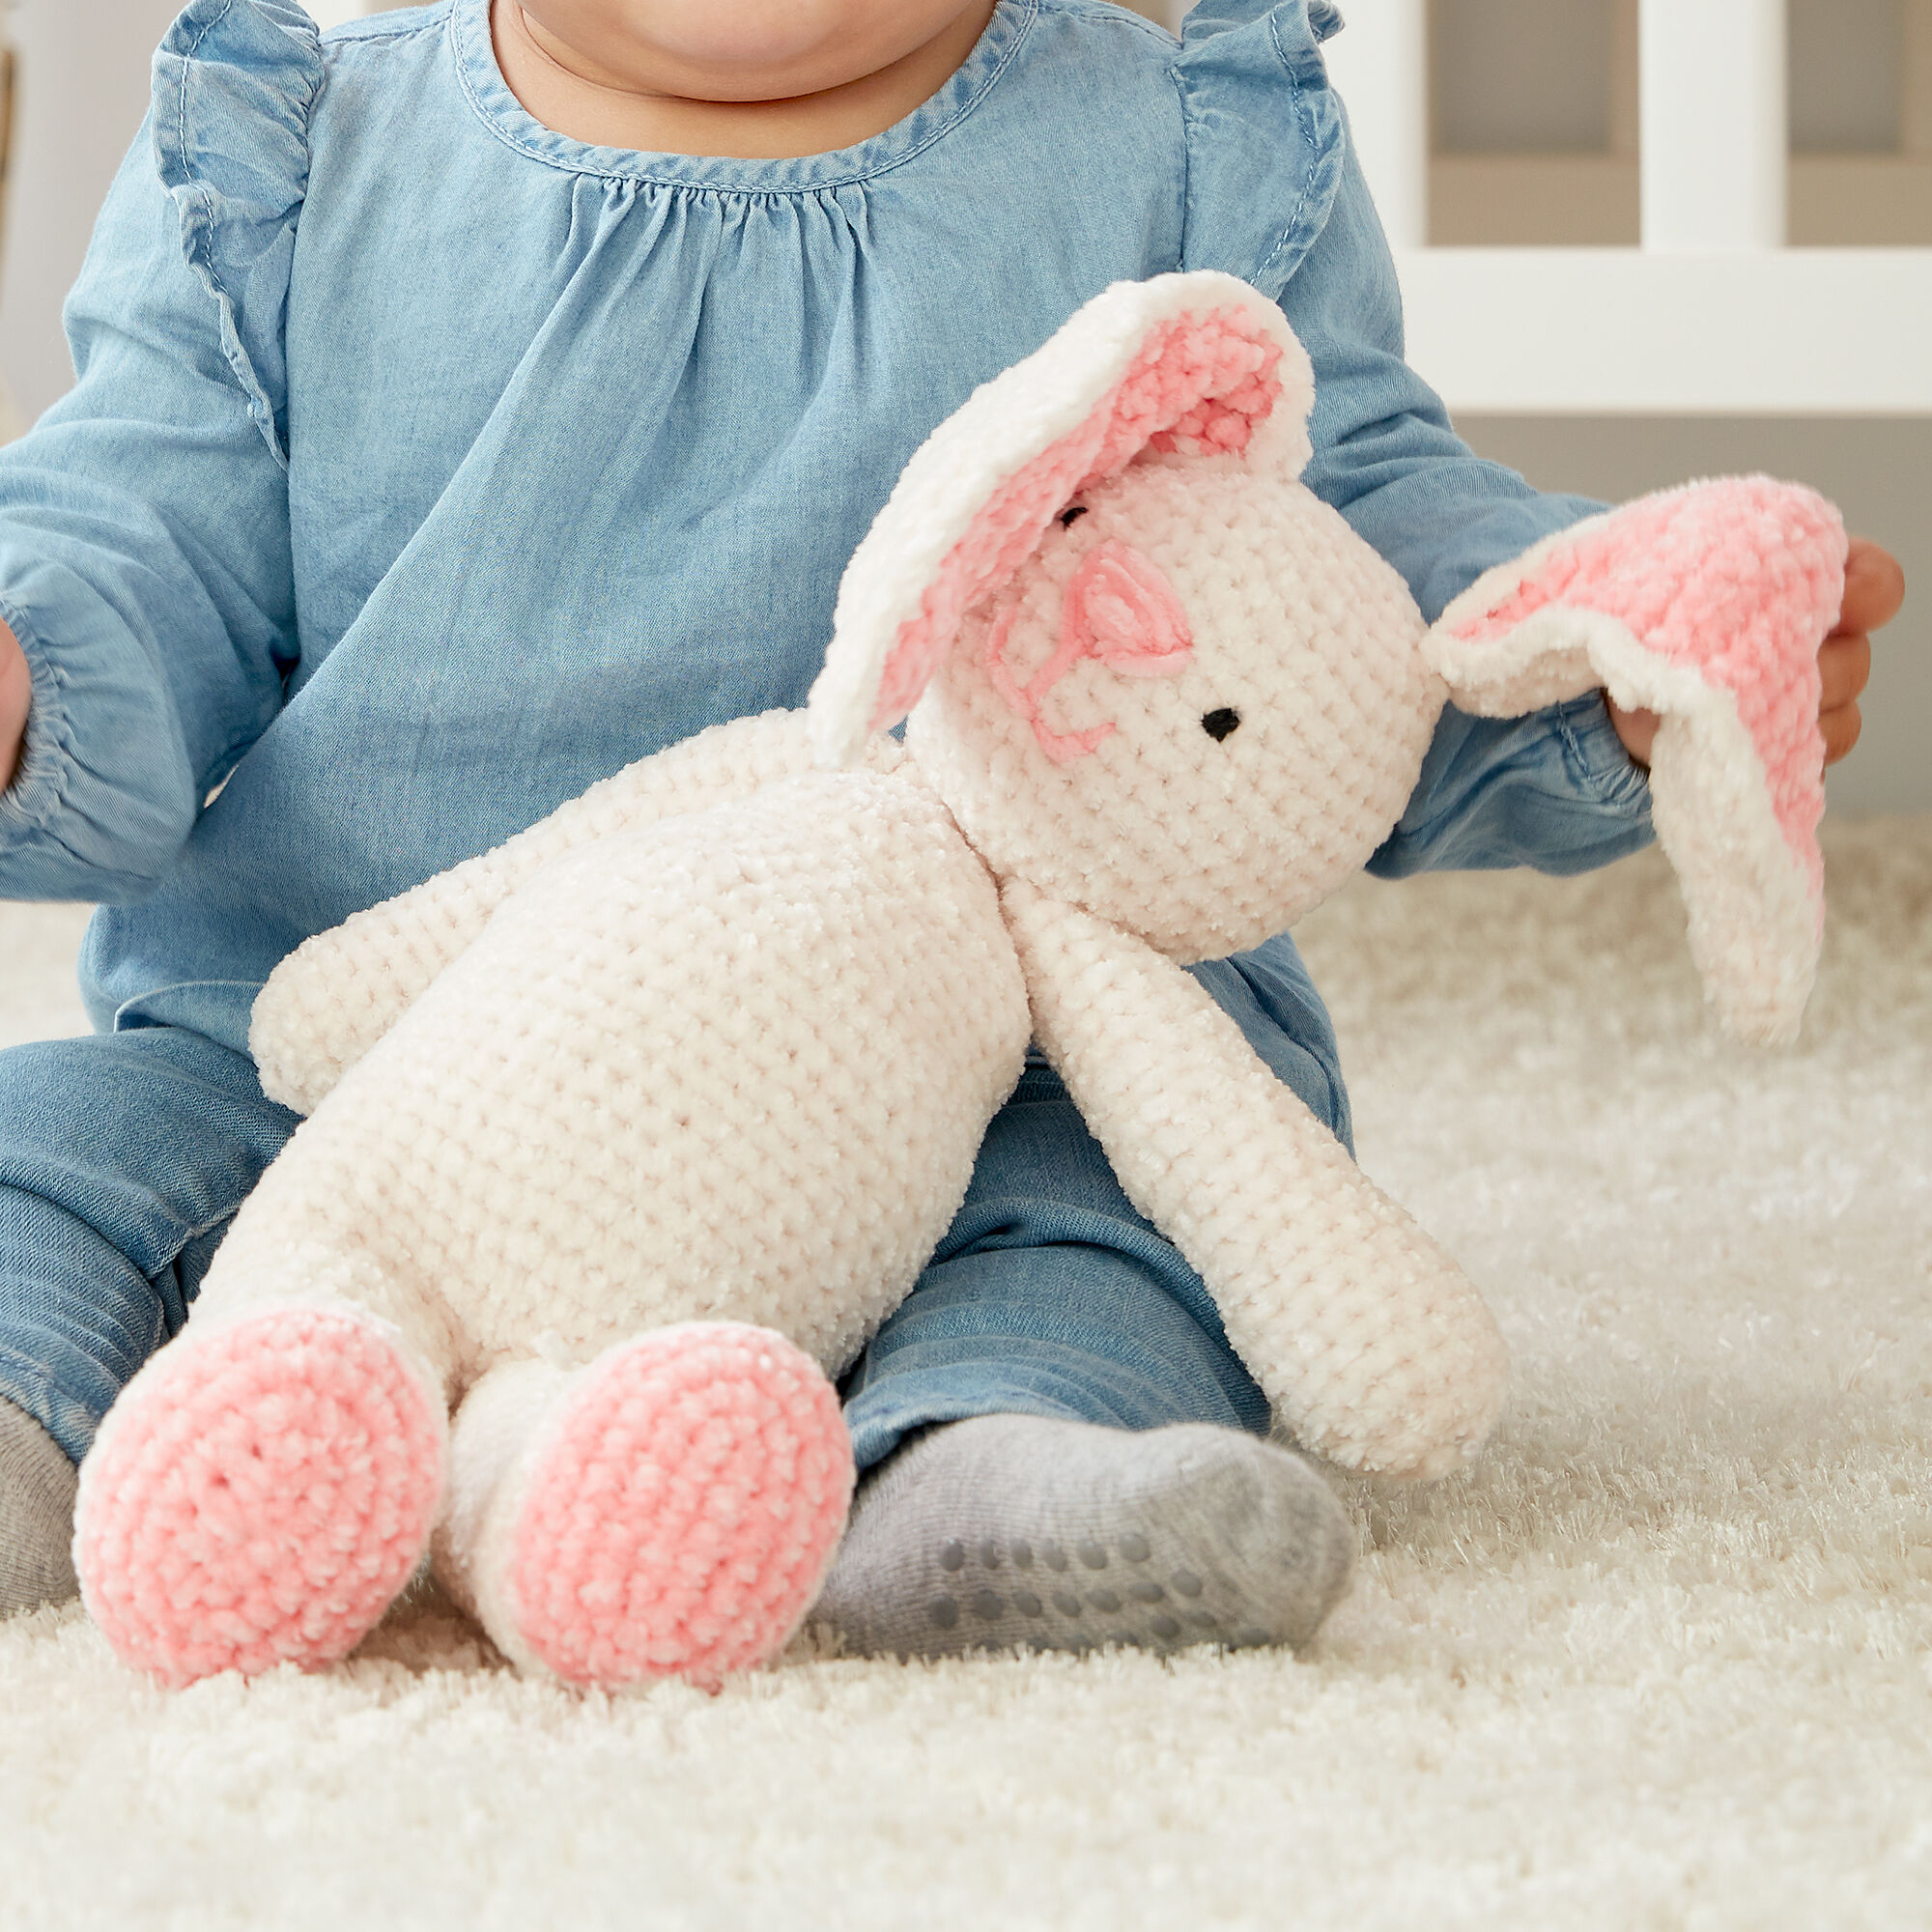 Amigurumi Bear Pattern - How to crochet Teddy Bear's paw or an ... | 2000x2000